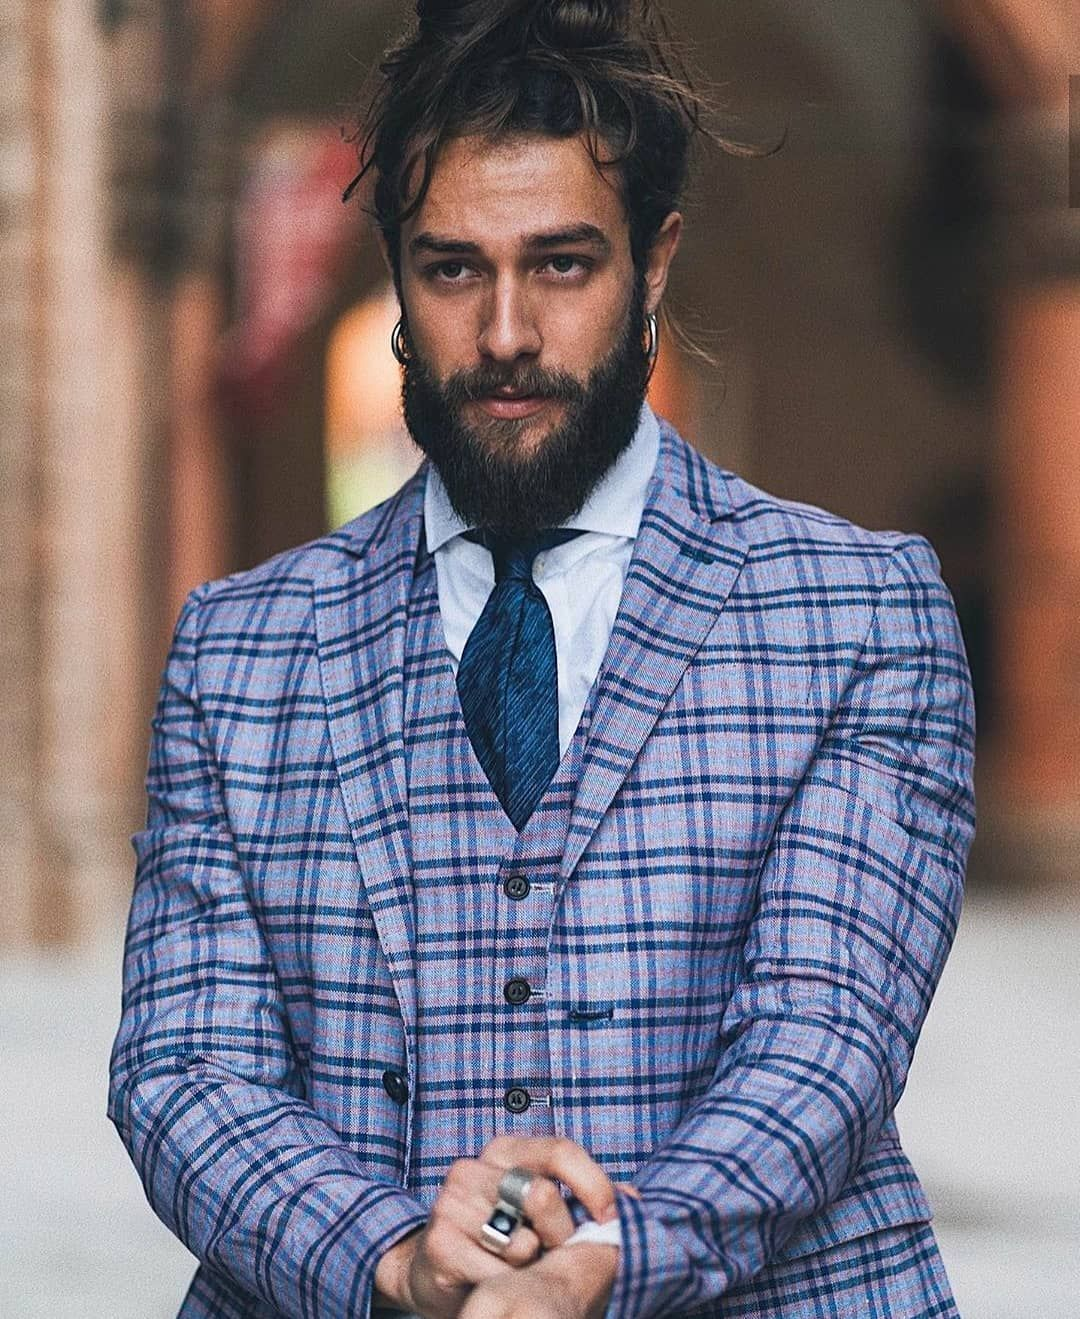 Stylish 💯  Model: @filippomelloni . . . #beard #beardmonsters #barbershop #fitness...